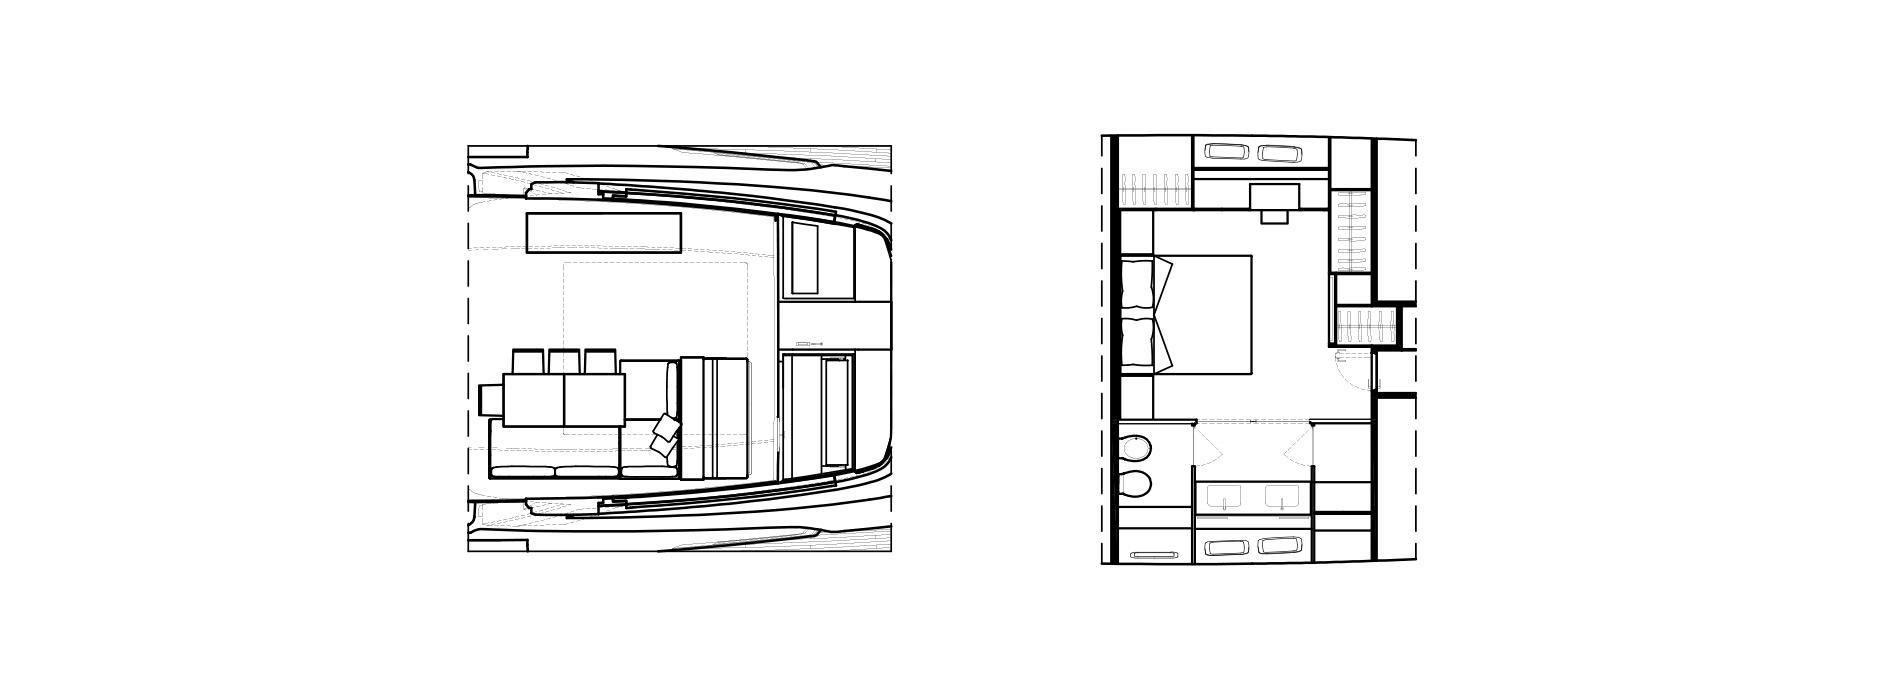 Sanlorenzo Yachts SX88 细节 Versione A